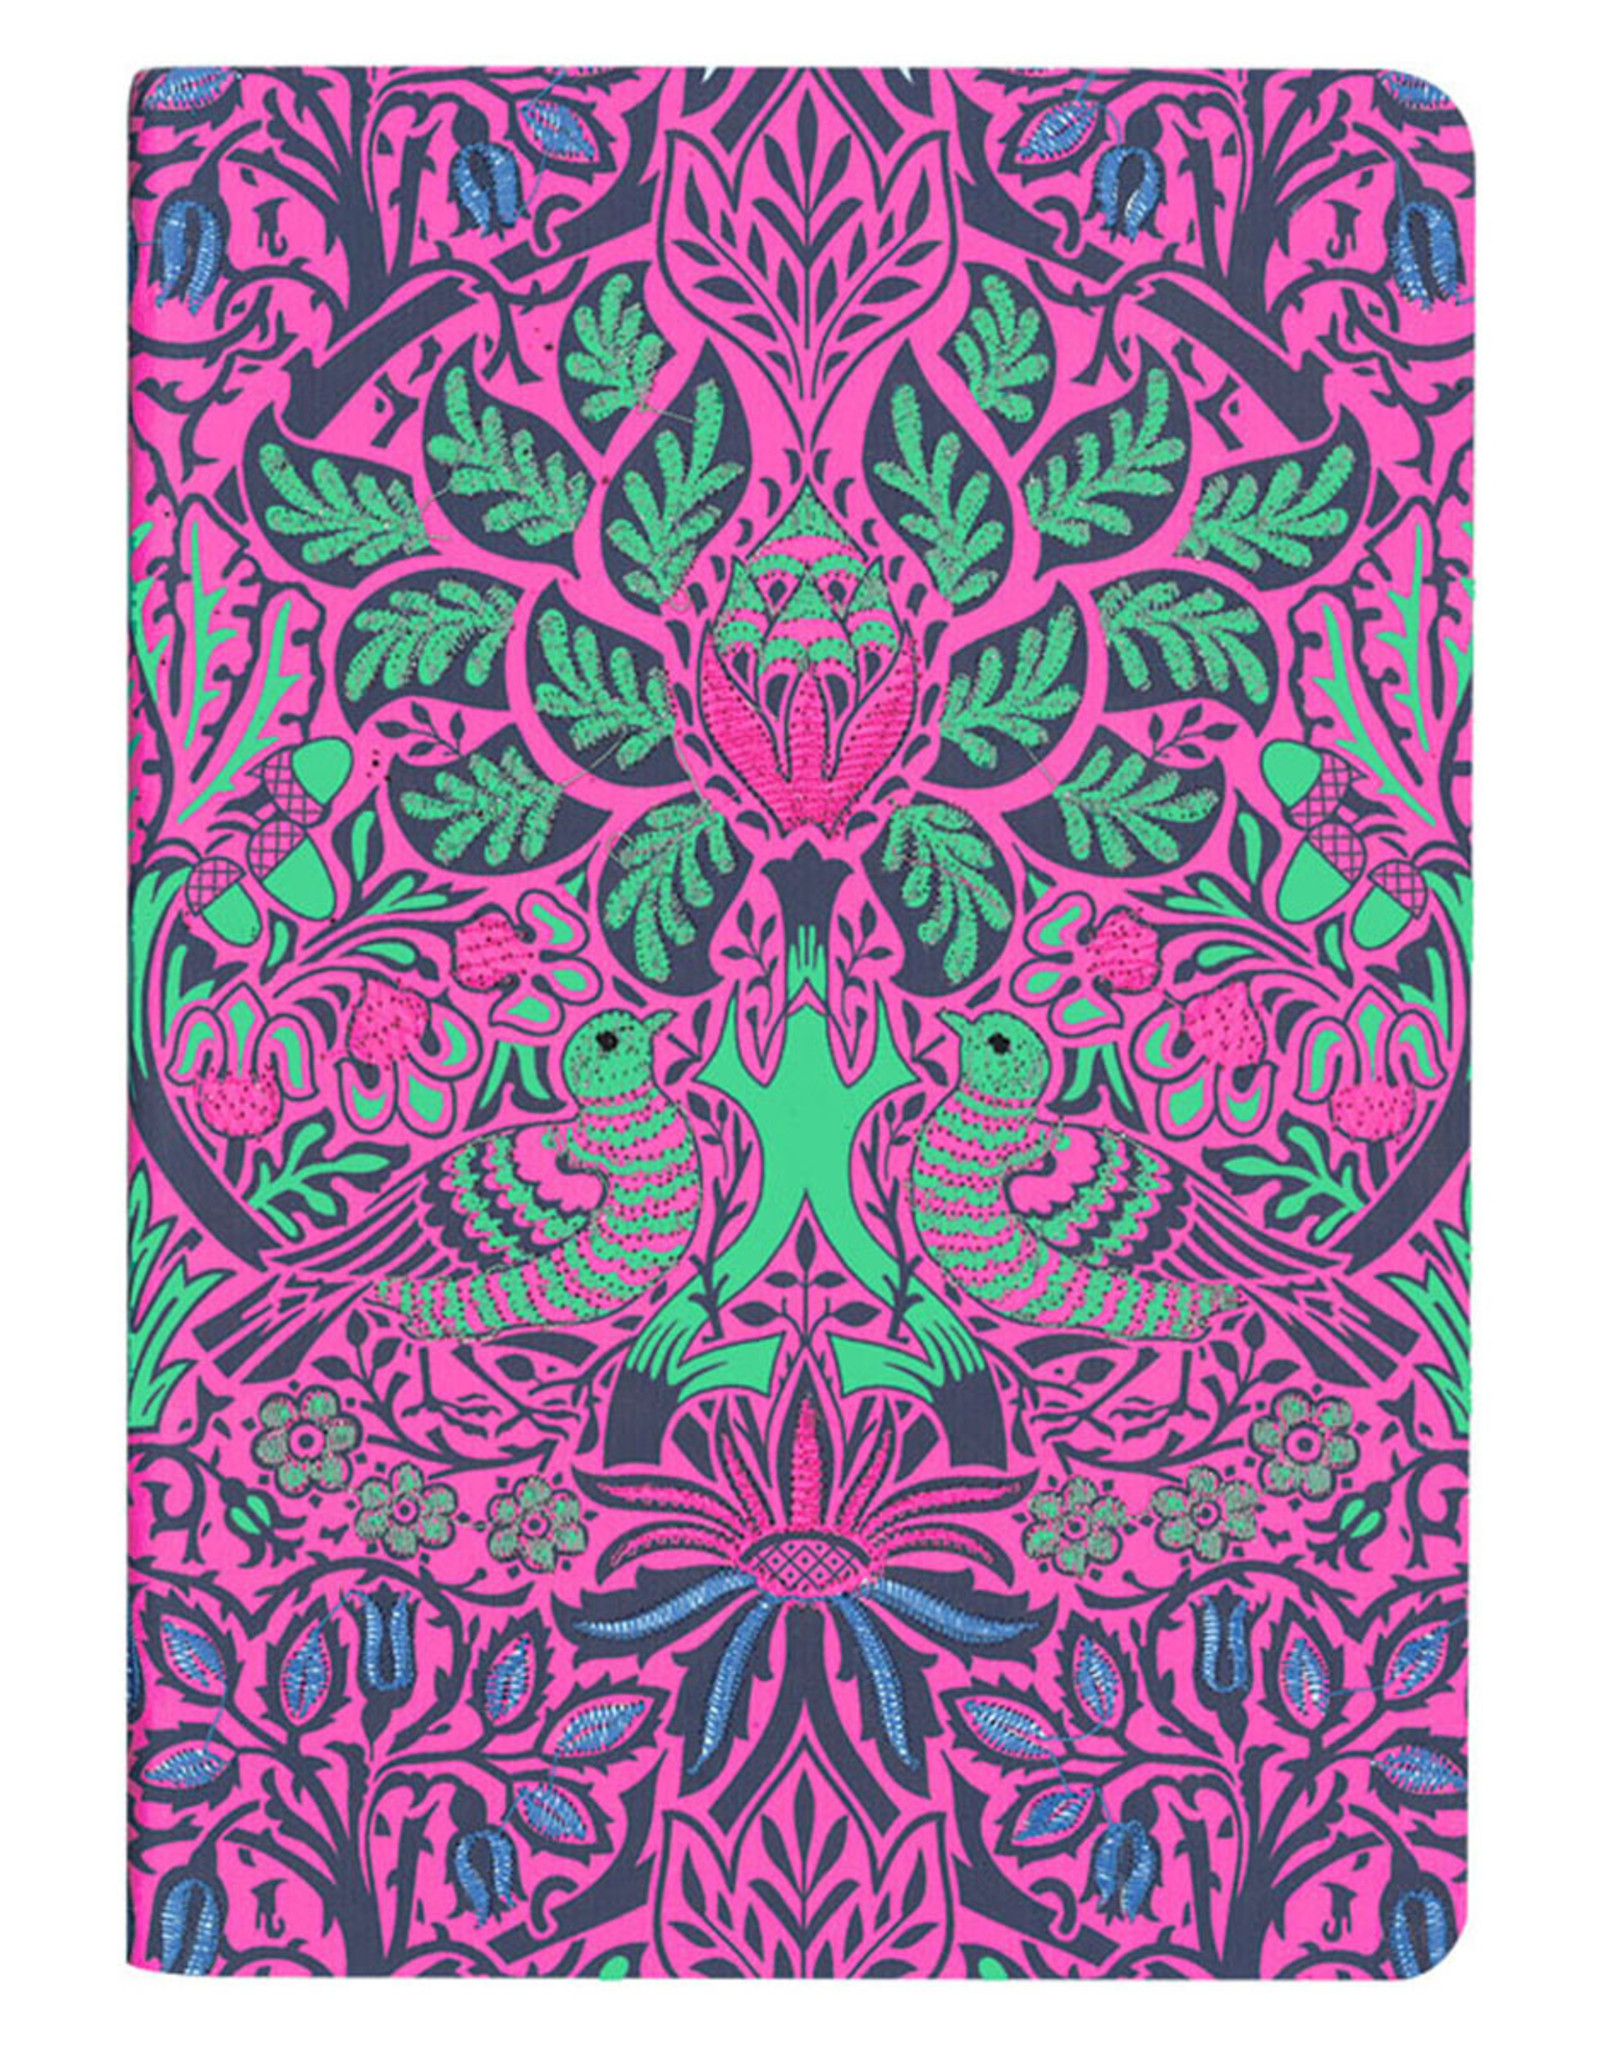 William Morris Dove & Rose Handmade Embroidered Journal